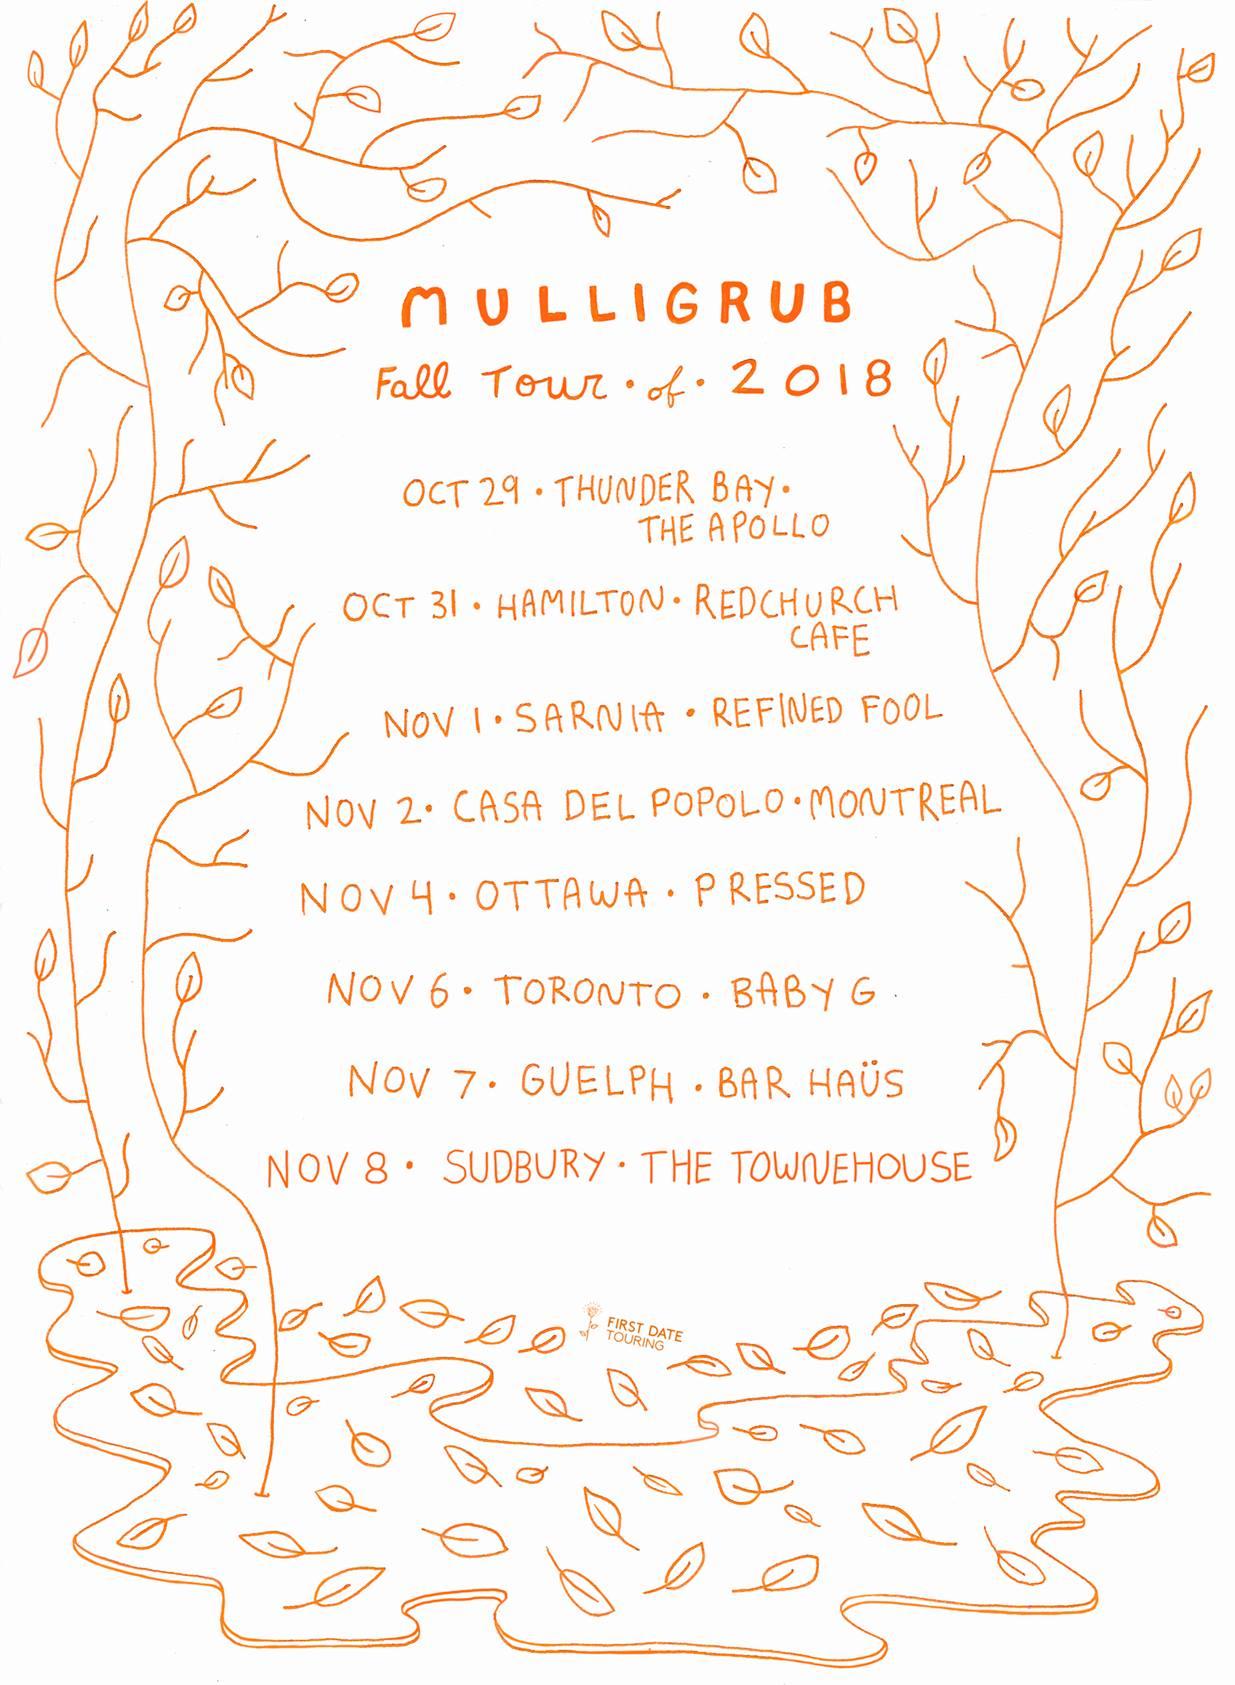 Grub Oct 2018 Tour.jpg